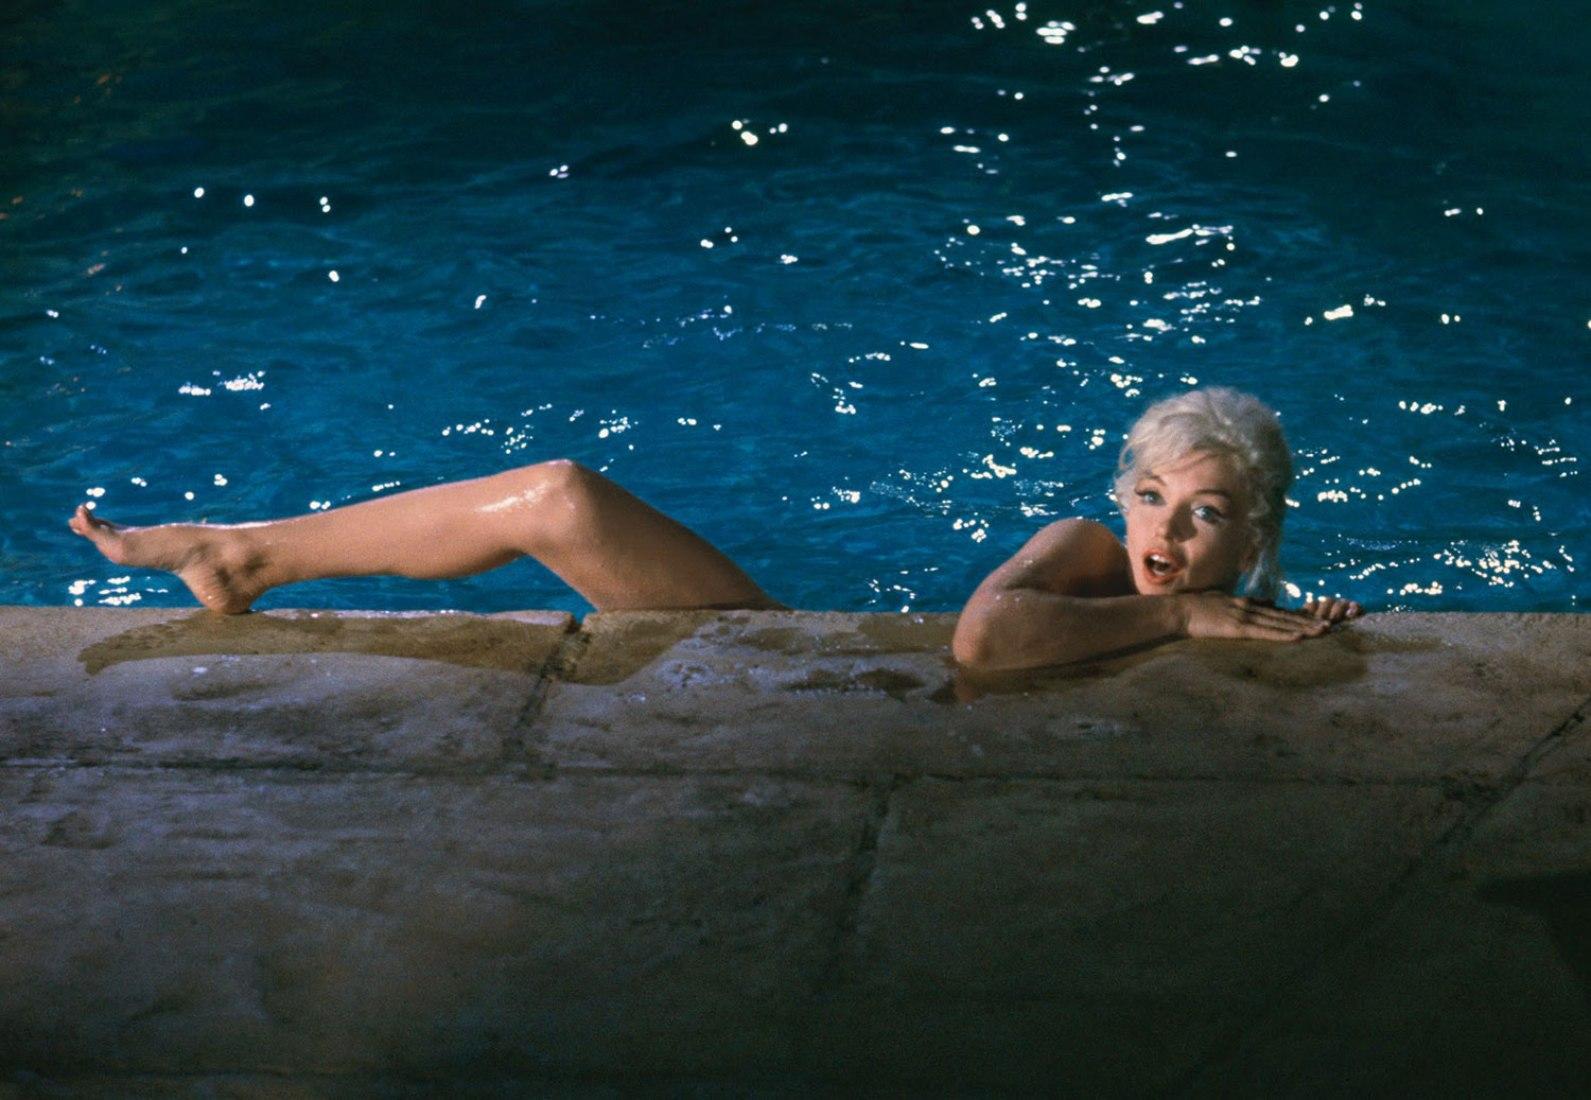 Backyard Oasis (Lawrence Schiller) Marilyn Monroe, 1962 photograph by Lawrence Schiller.